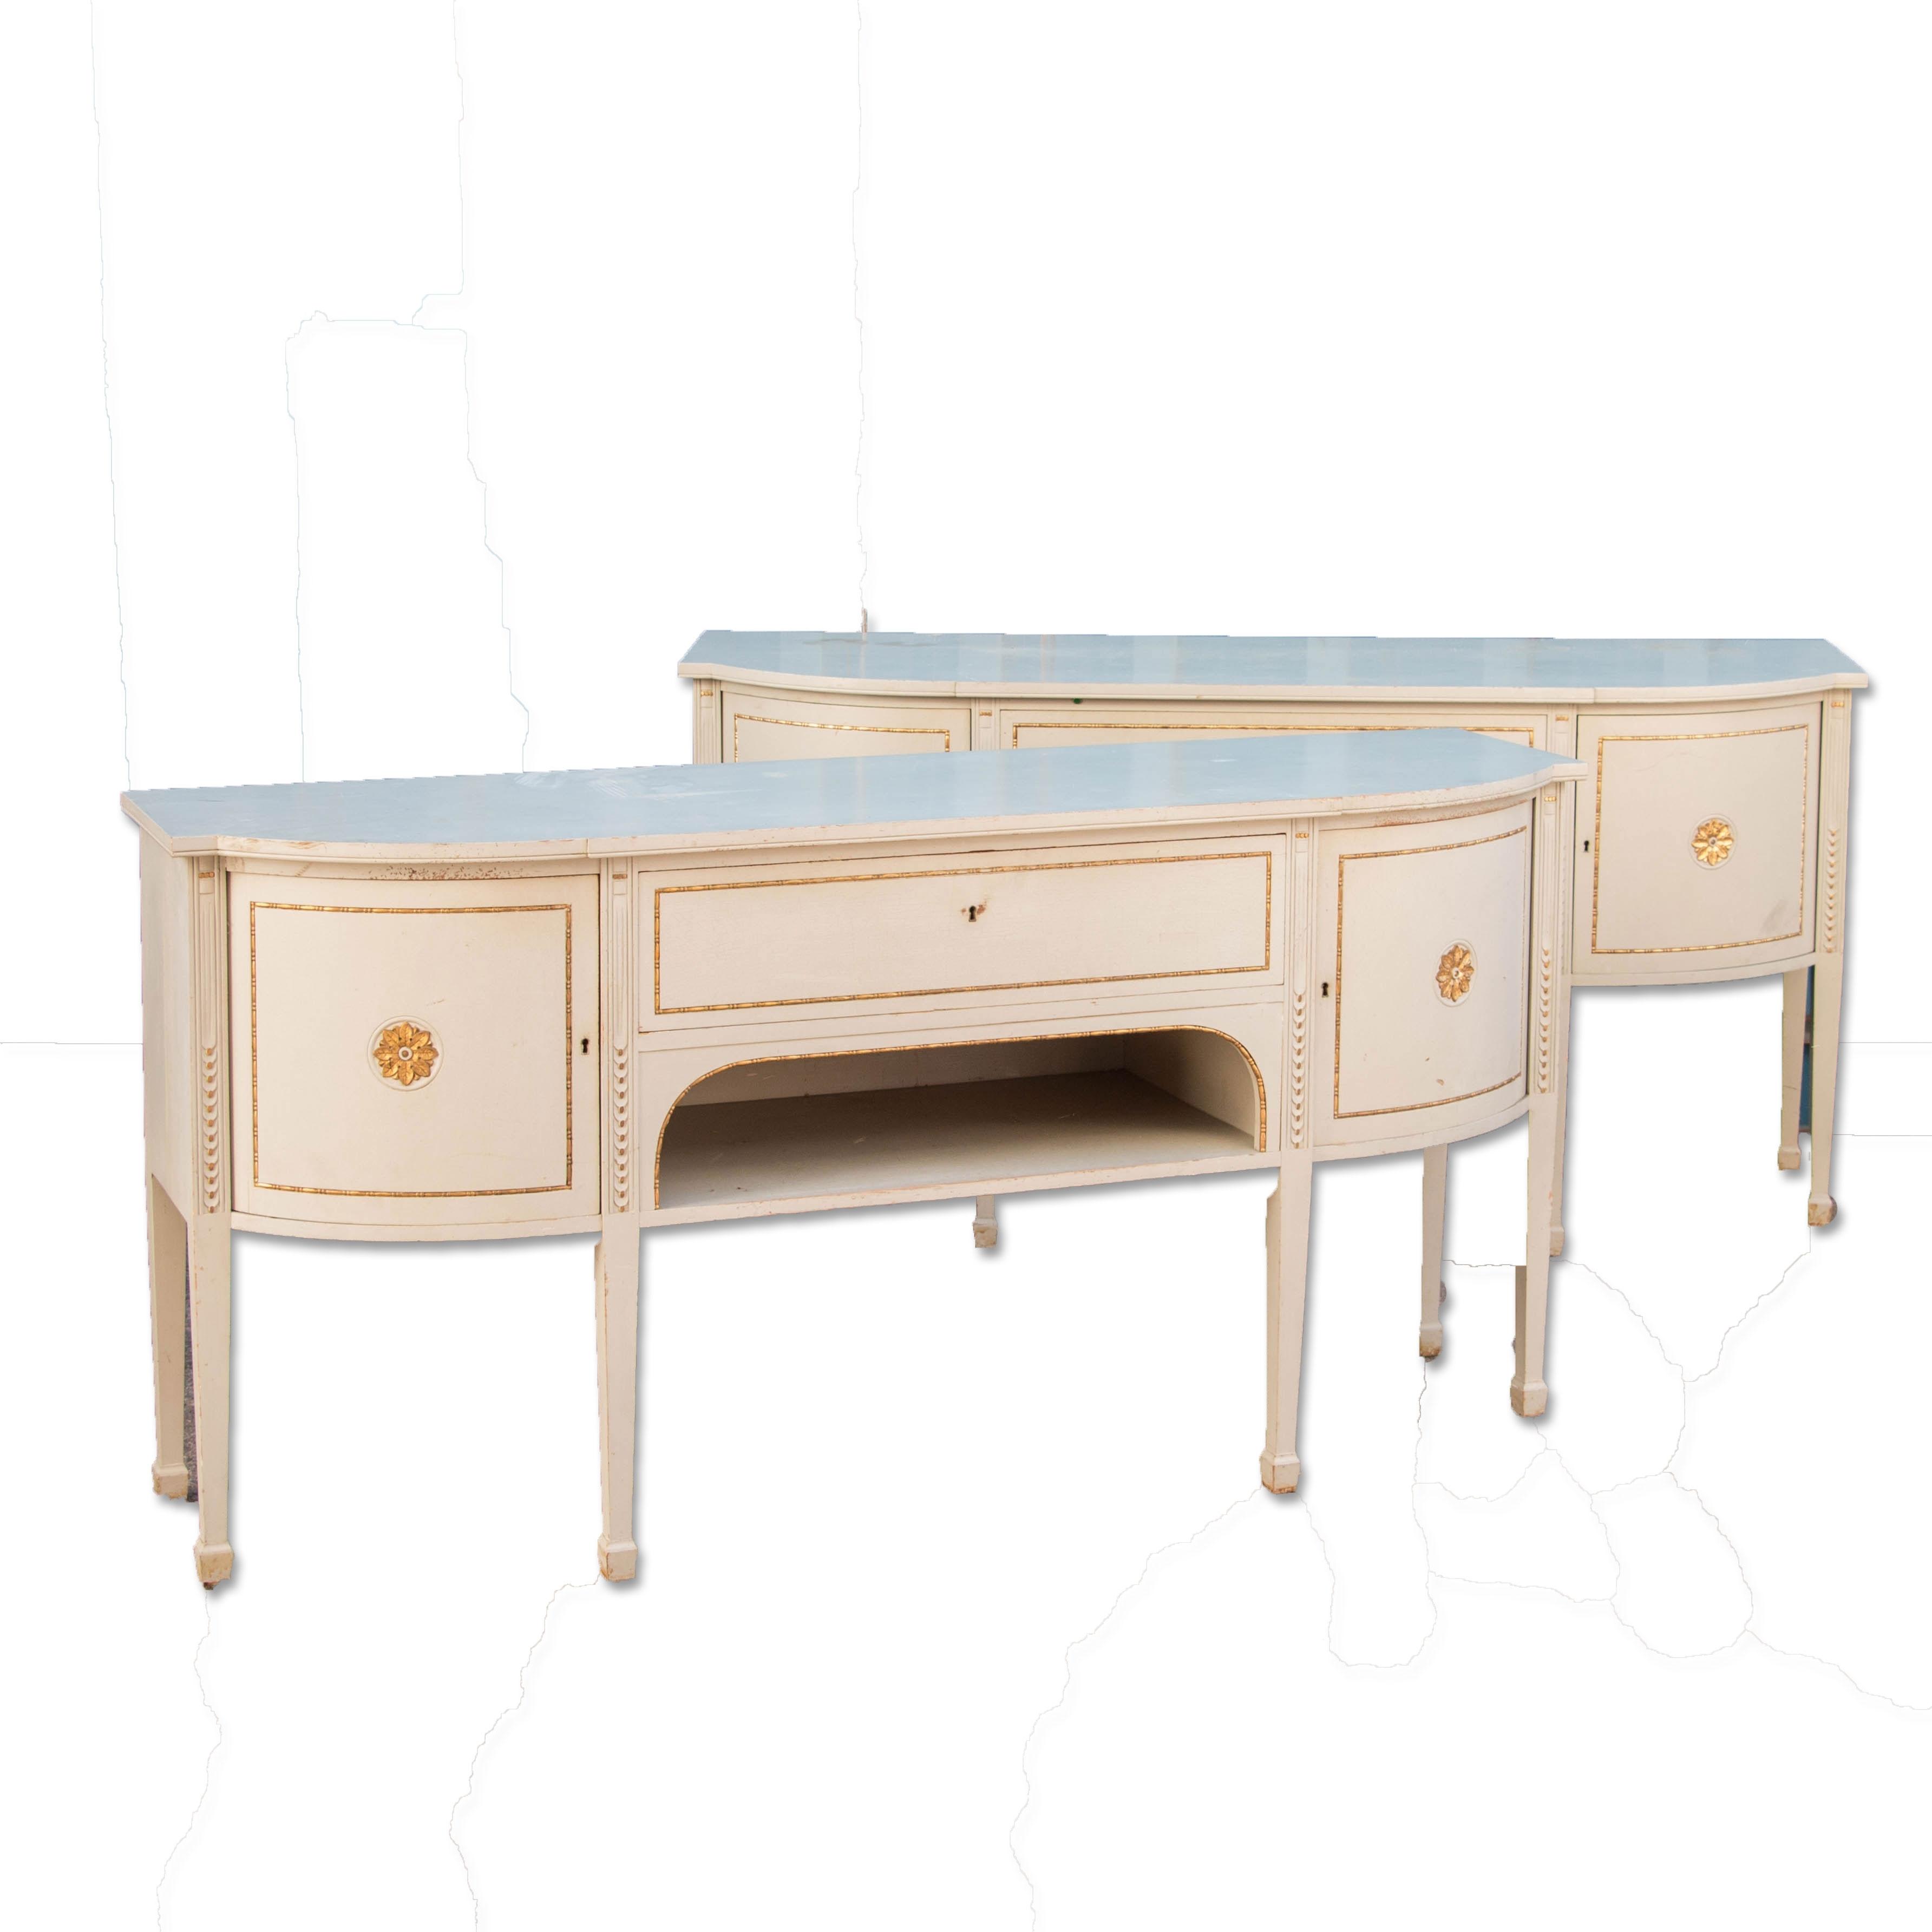 Sideboards | Scandinavian Antiques | Antique Furniture For Sale for Natural Oak Wood 78 Inch Sideboards (Image 26 of 30)